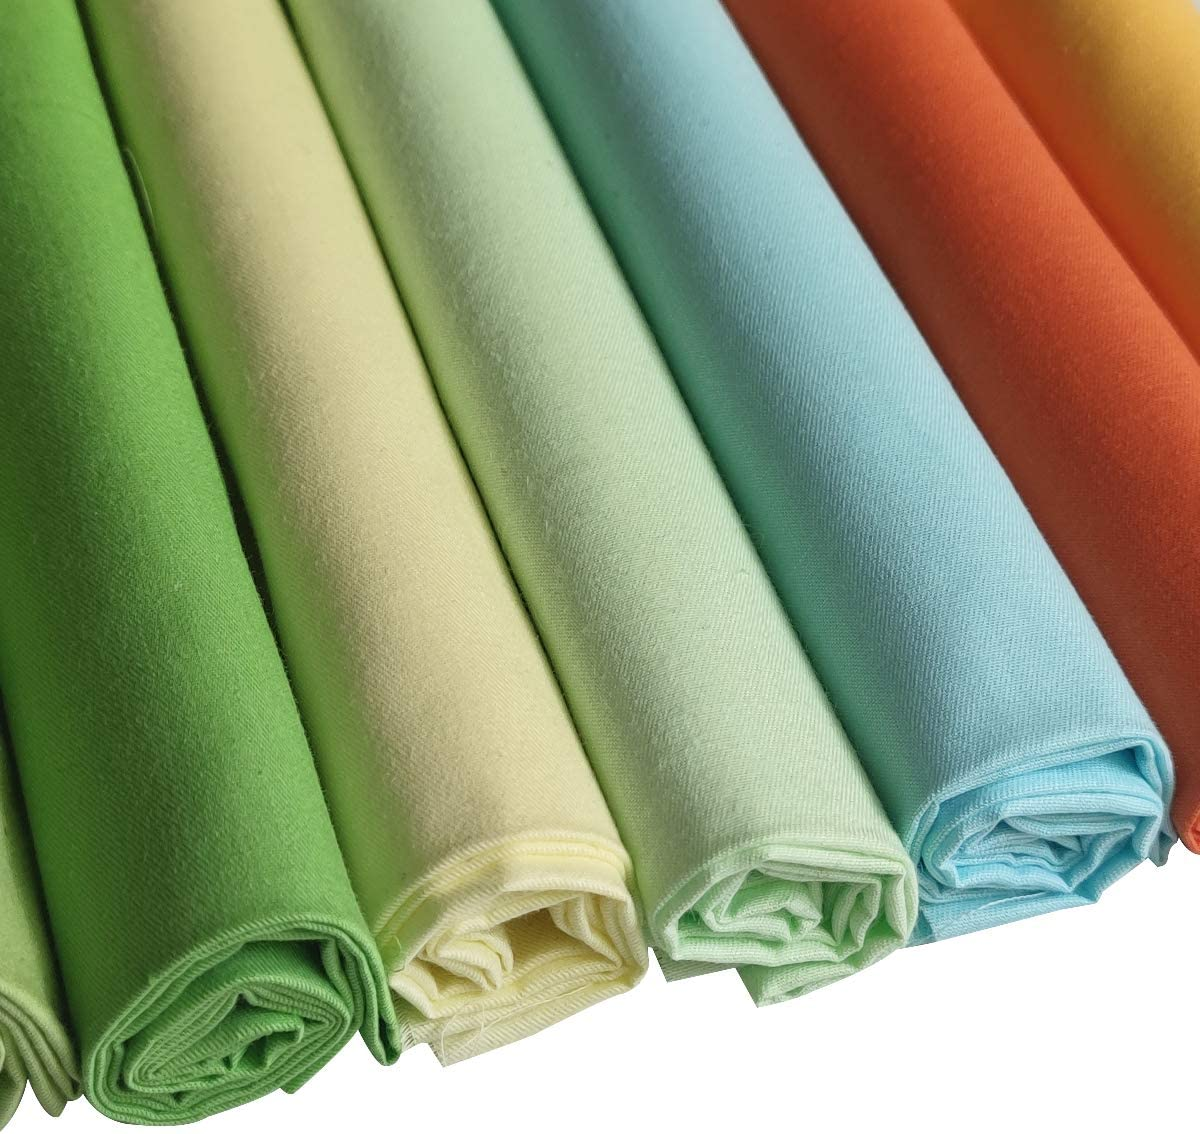 CraftsDIY Cotton Fabric Squares 46cm*56cm Patchwork Fabric Bundle Pre-Cut Squares for DIY Sewing Scrapbooking 7PCS Orange Yellow Fat Quarter